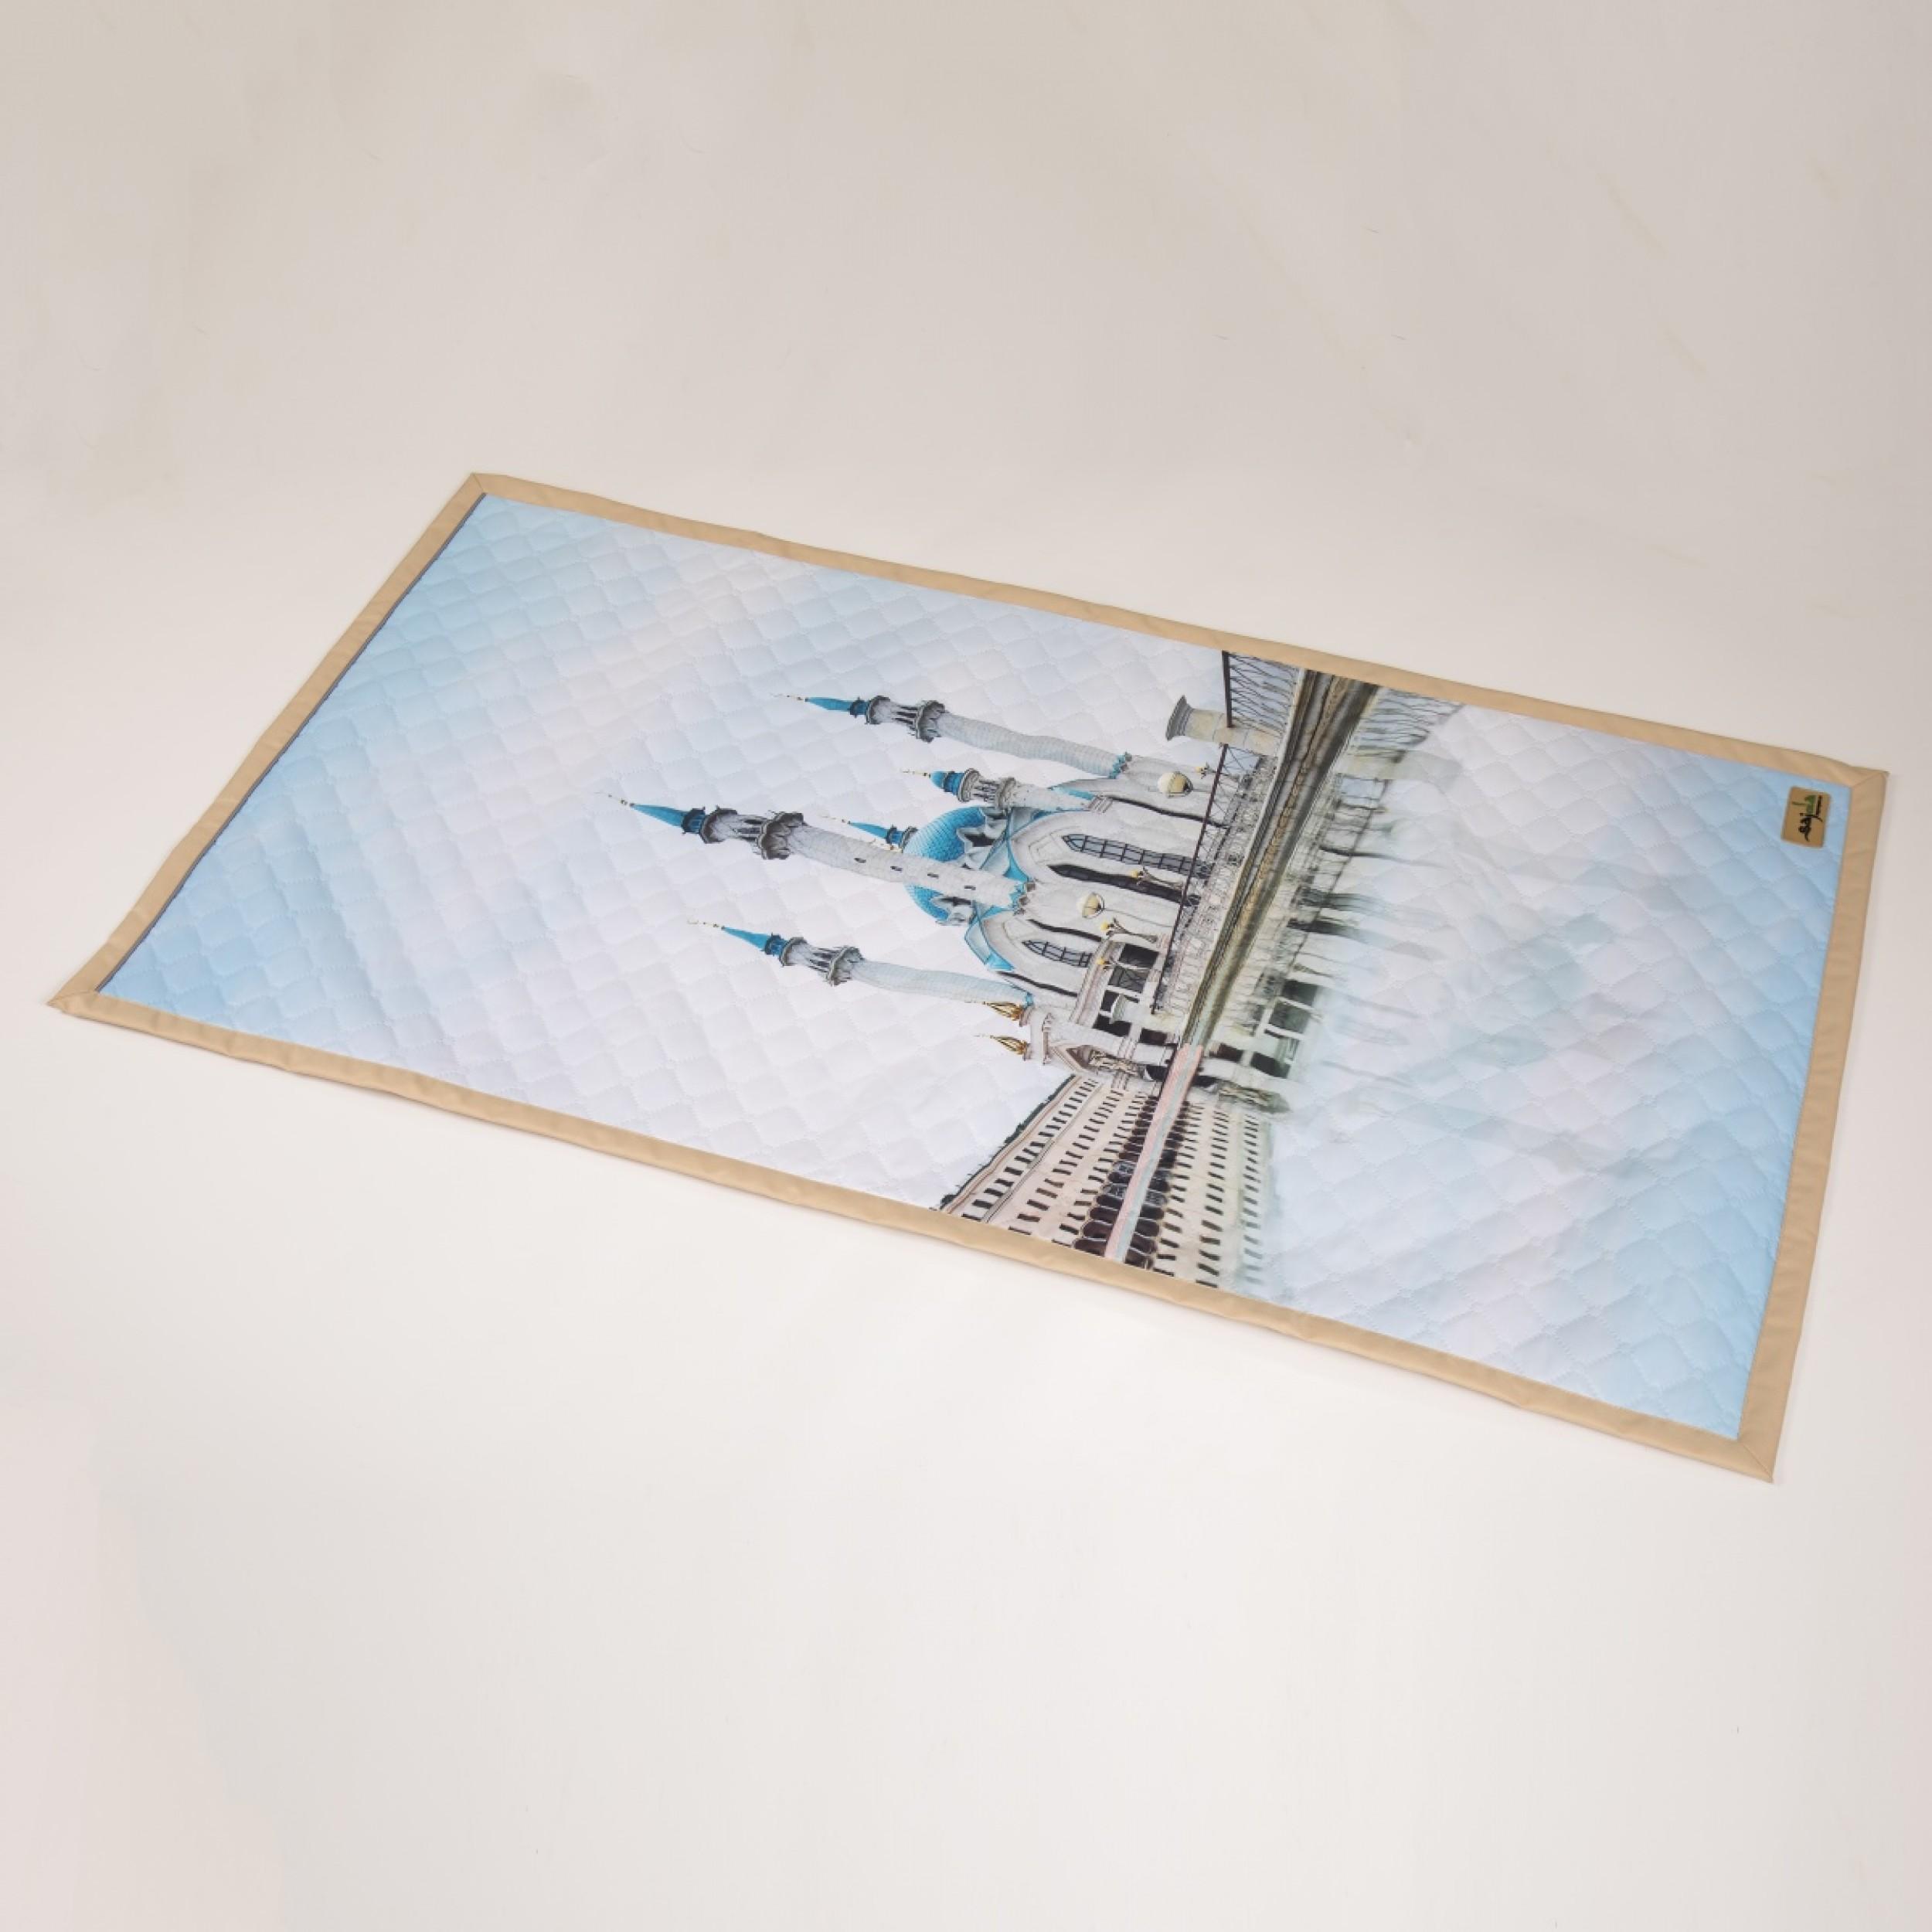 "Непромокаемый коврик для намаза ""Мечеть Кул Шариф"" (размер 120x62)"